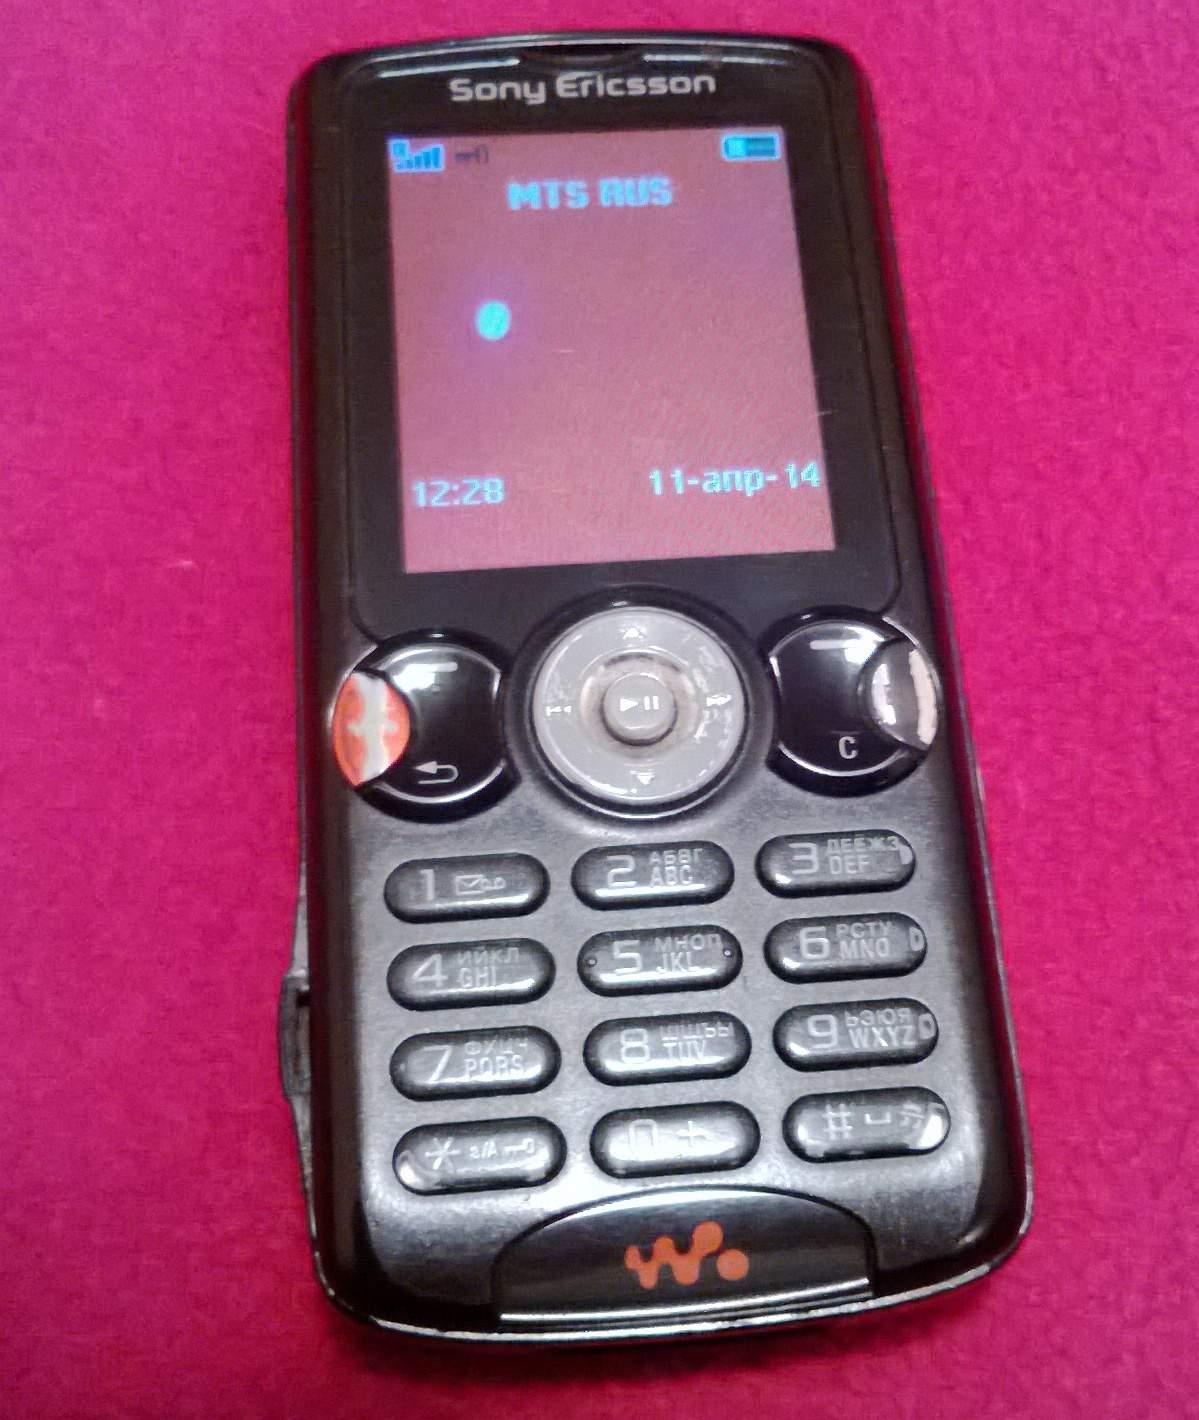 Мобильный телефон sonyericsson w810i все на фото!